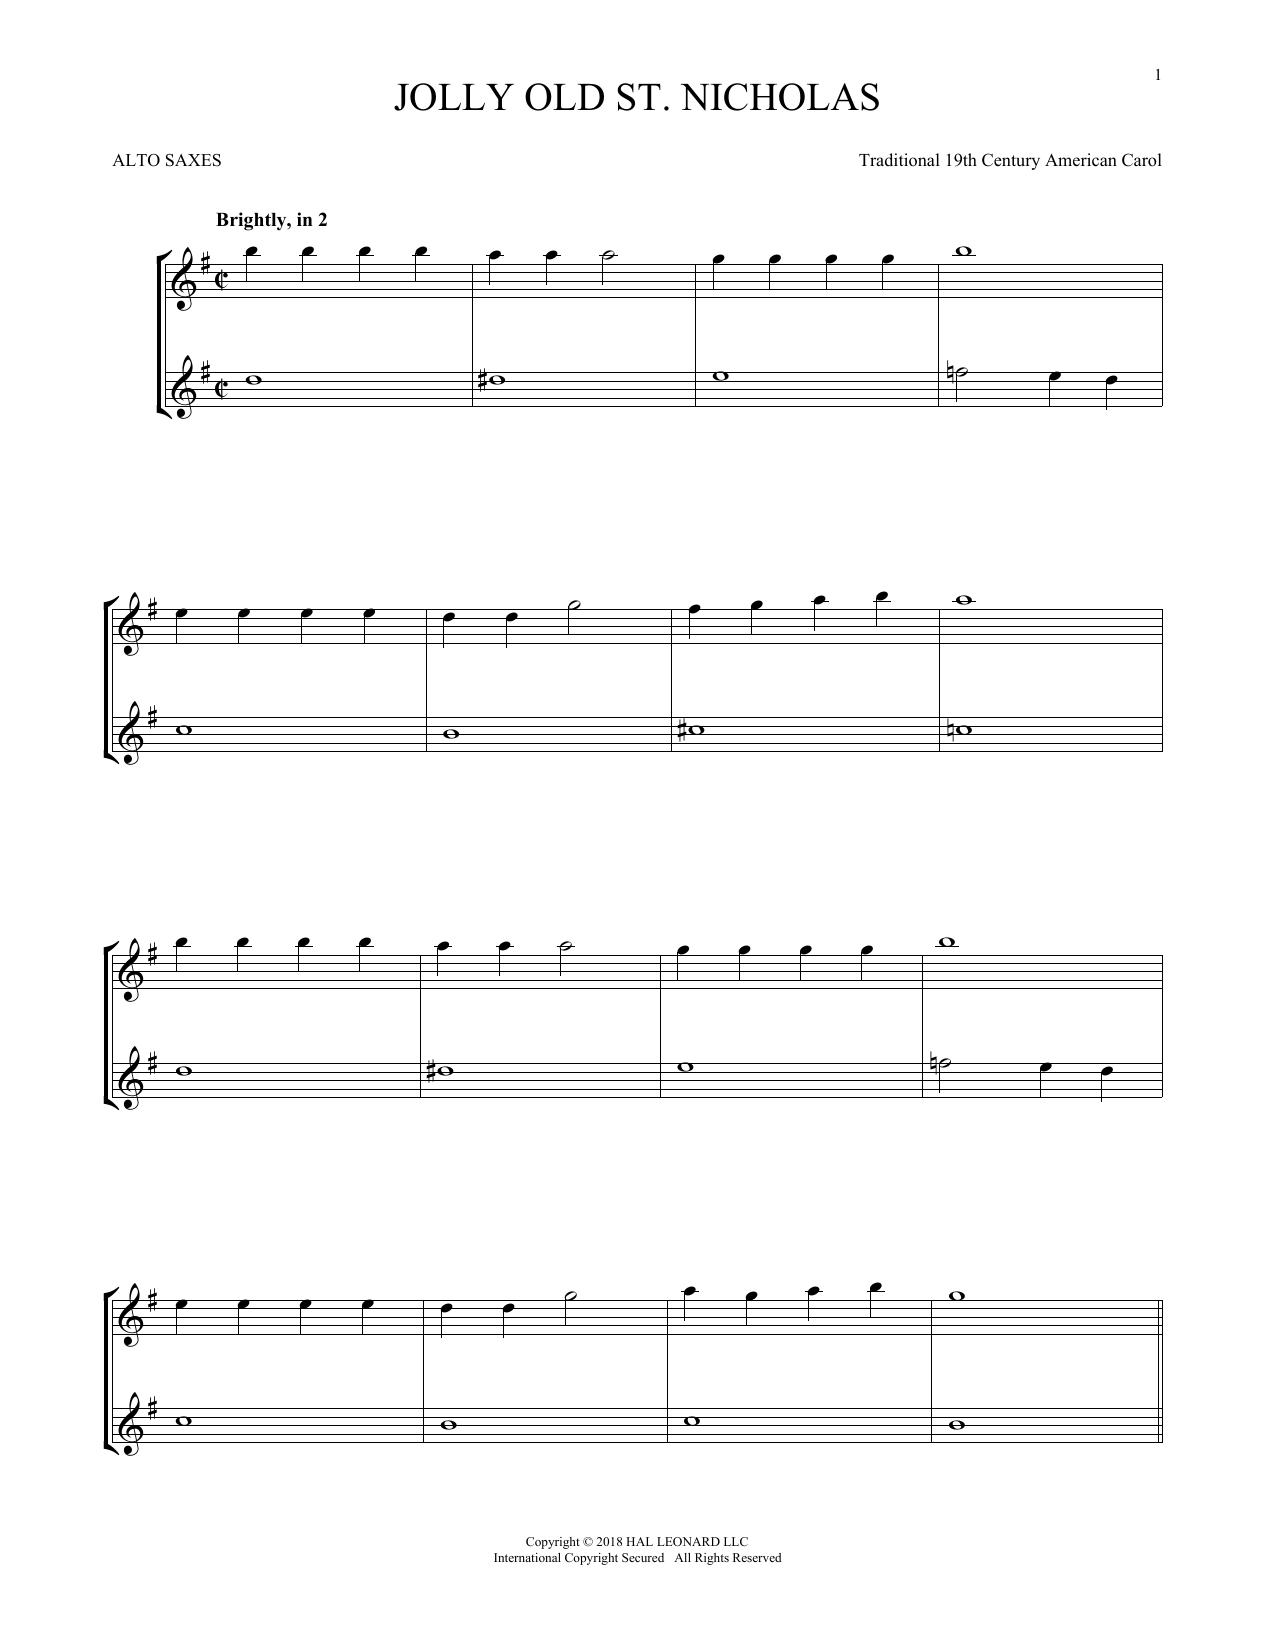 Jolly Old St. Nicholas (Alto Sax Duet)